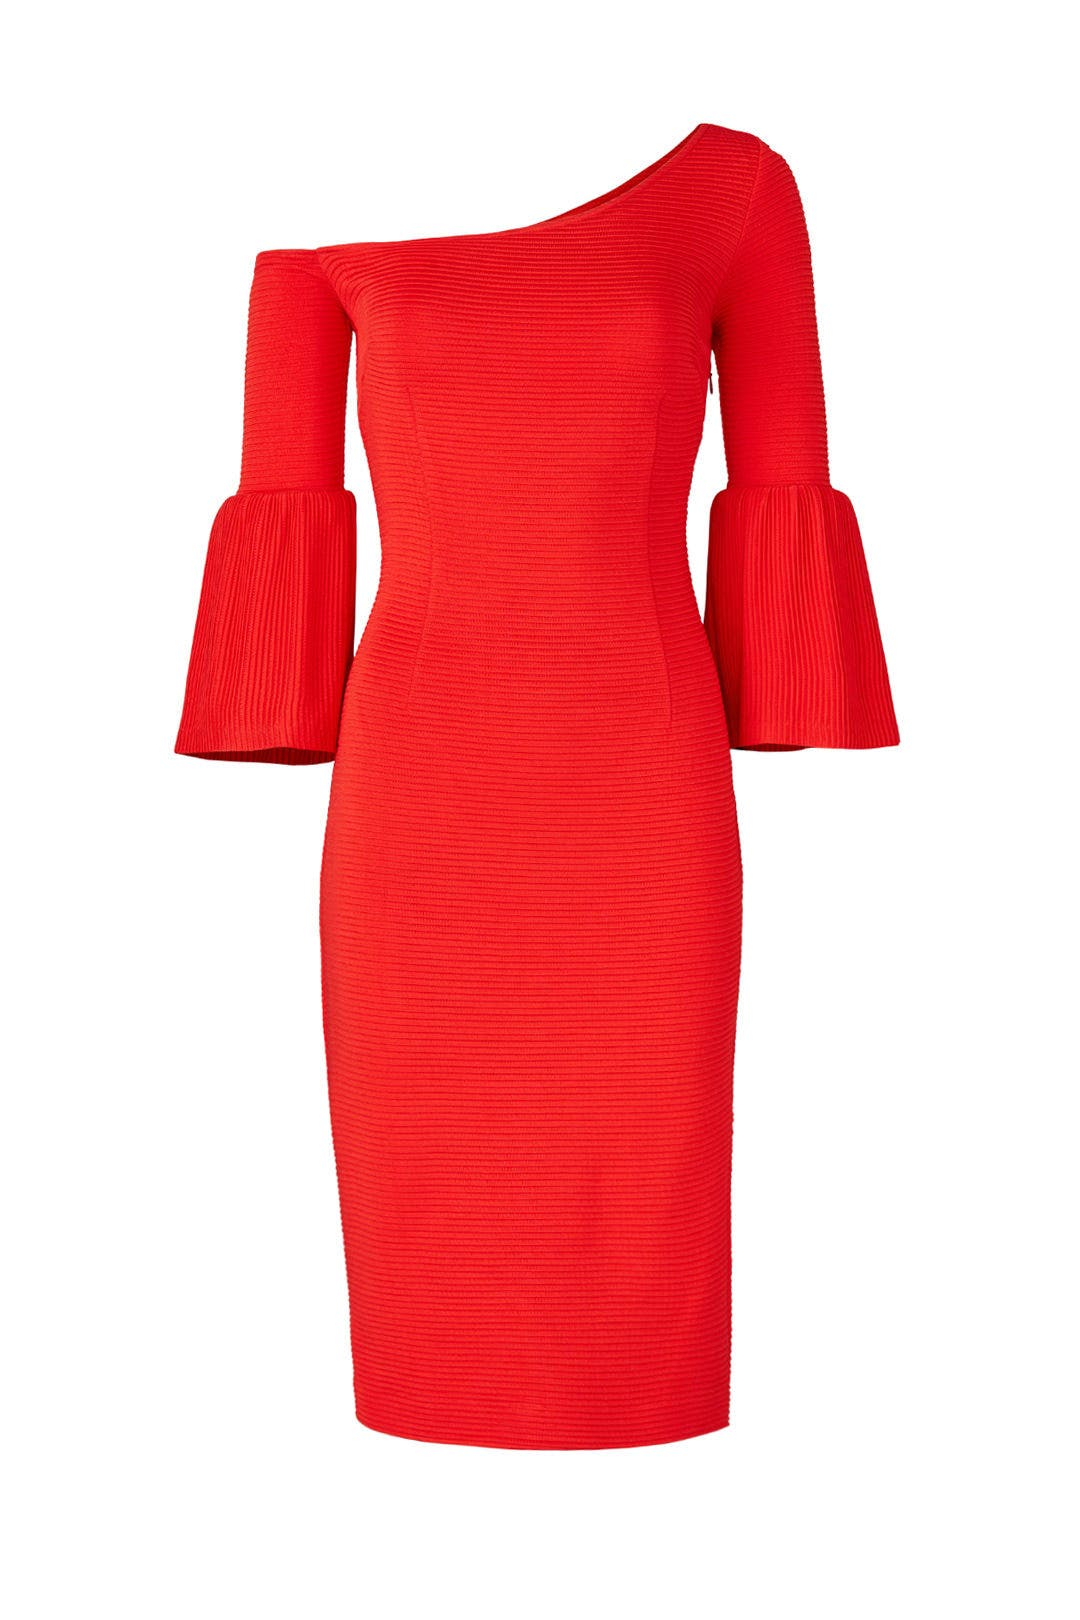 bcb80ff622dd00 Ollie Dress by Trina Turk for $50 | Rent the Runway